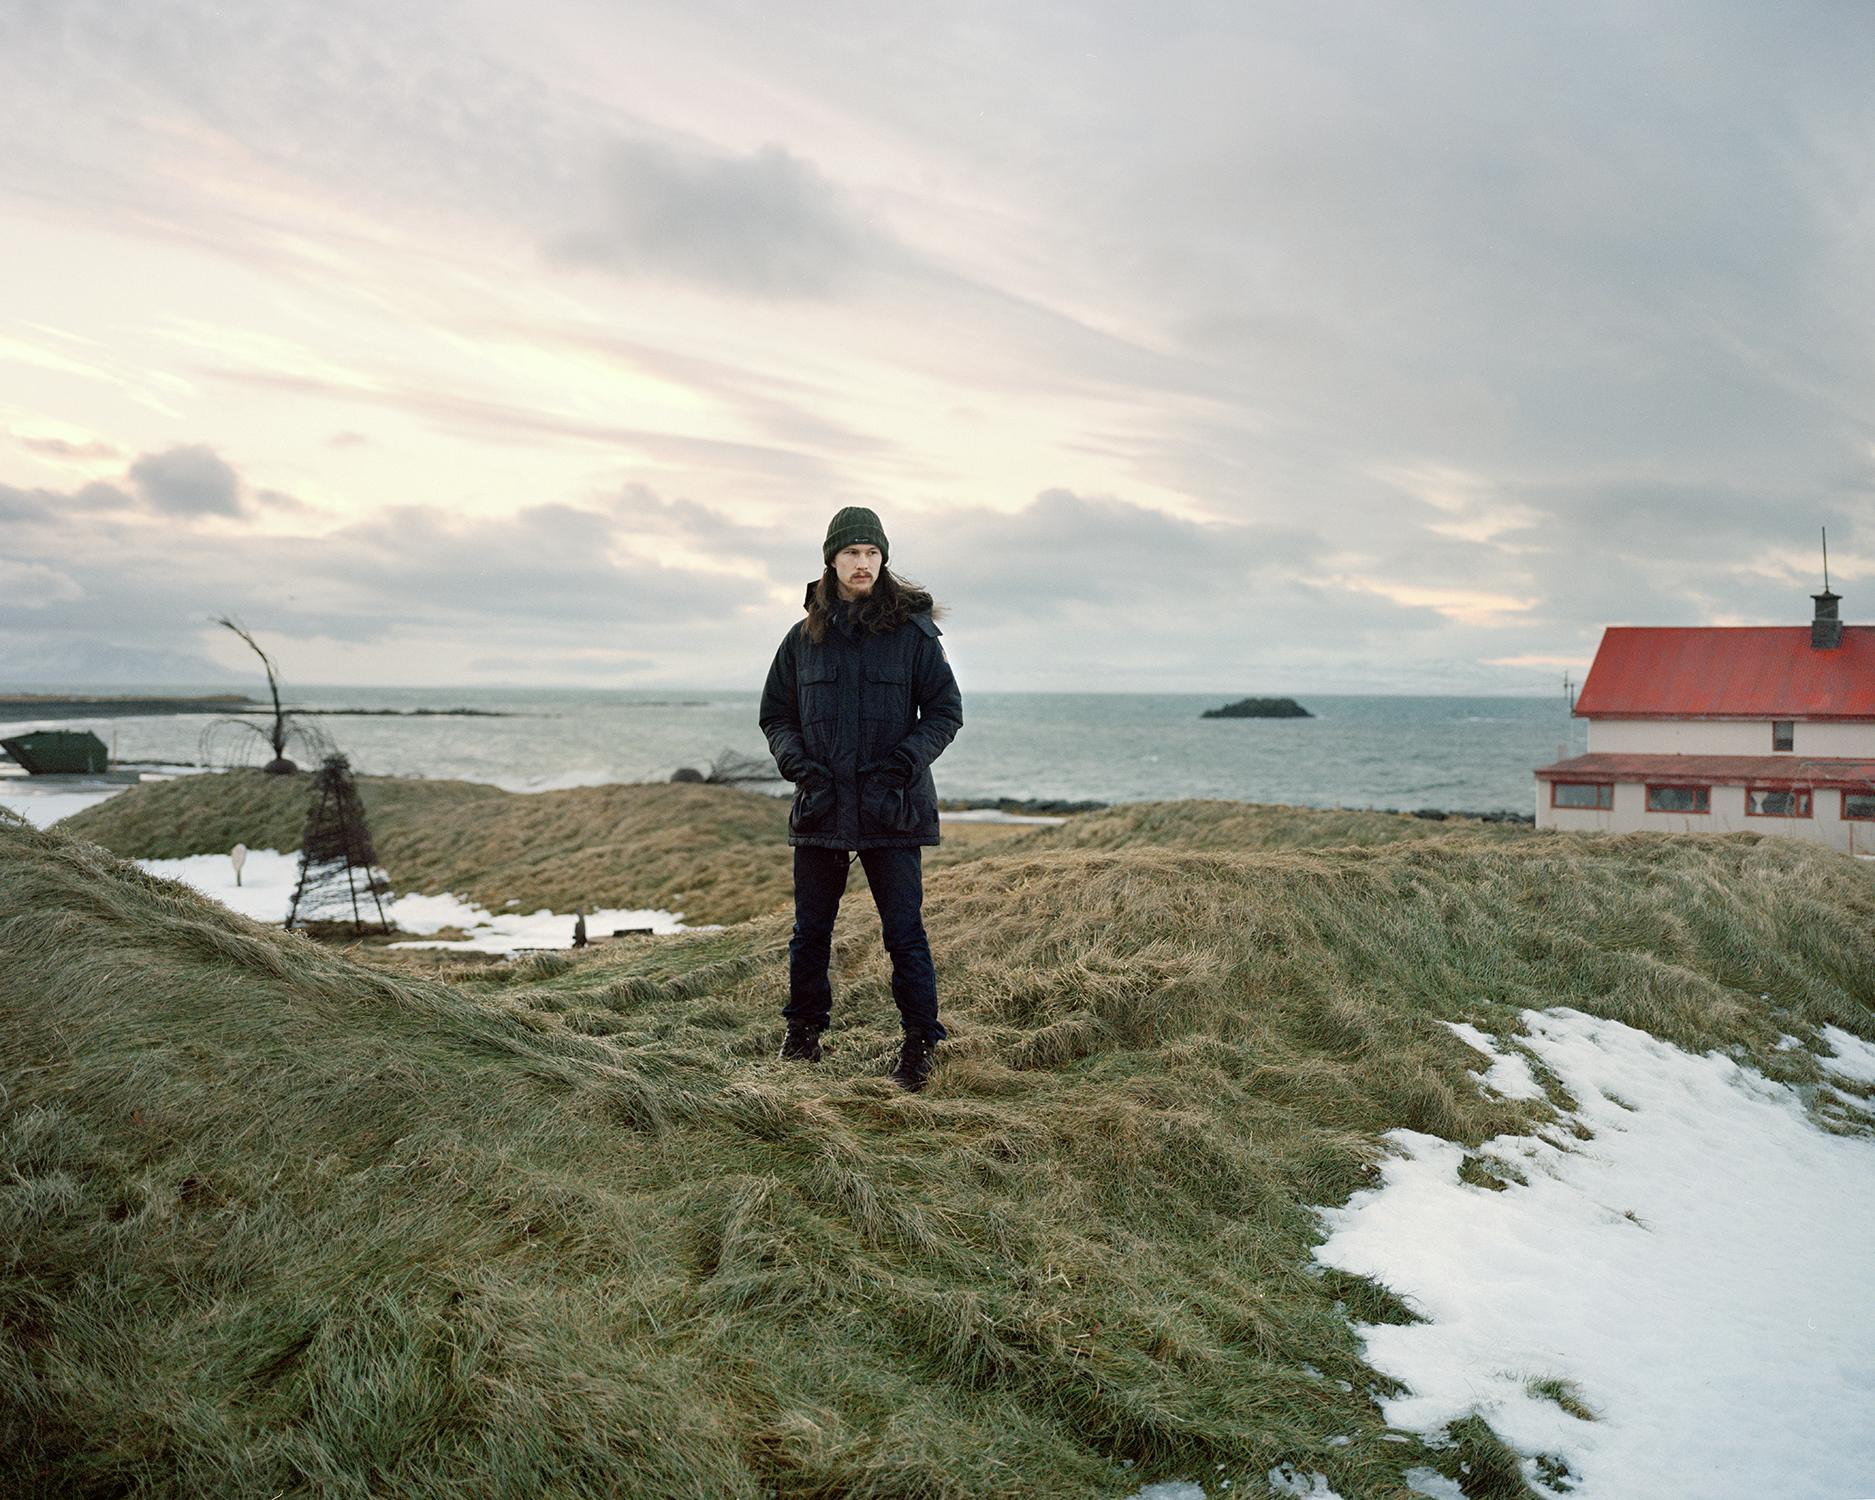 Iceland_001 001.jpg